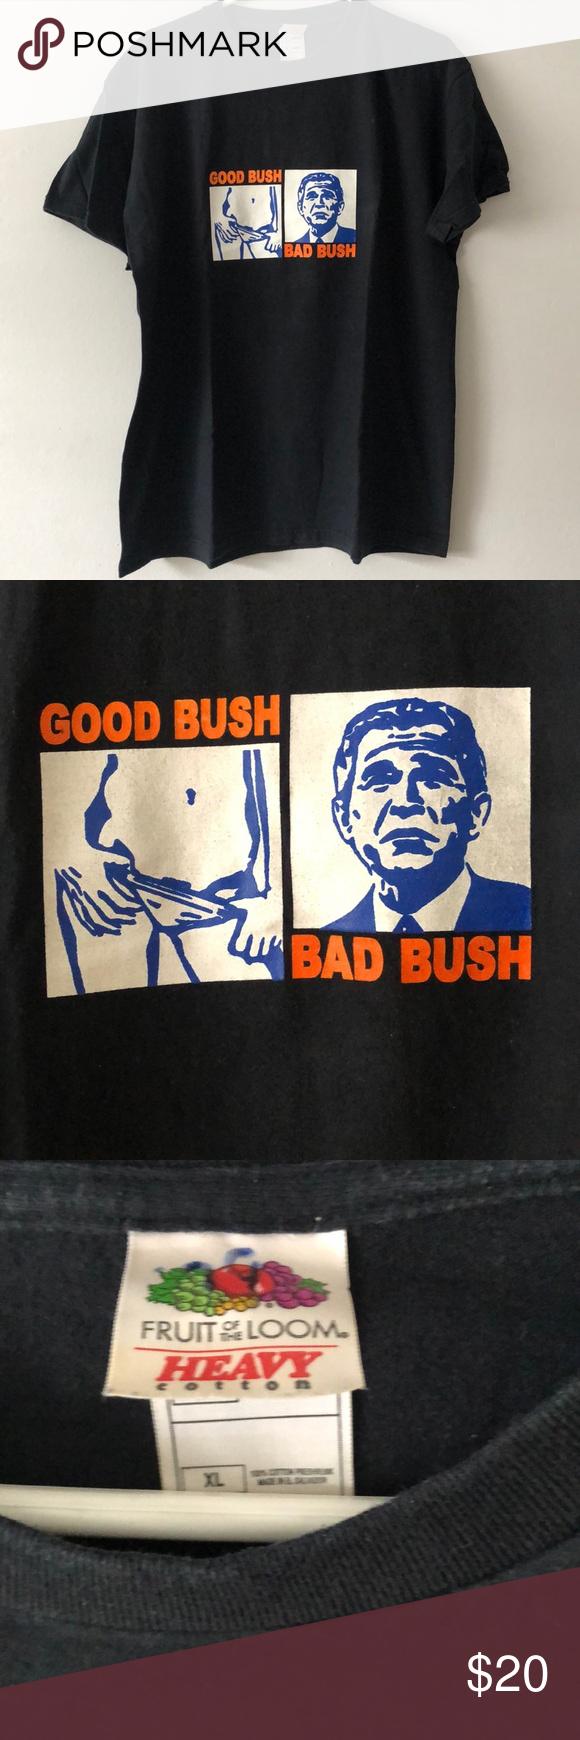 Vintage 2002 Good Bush Bad Bush Graphics T Shirt T Shirt Shirts Tee Shirts